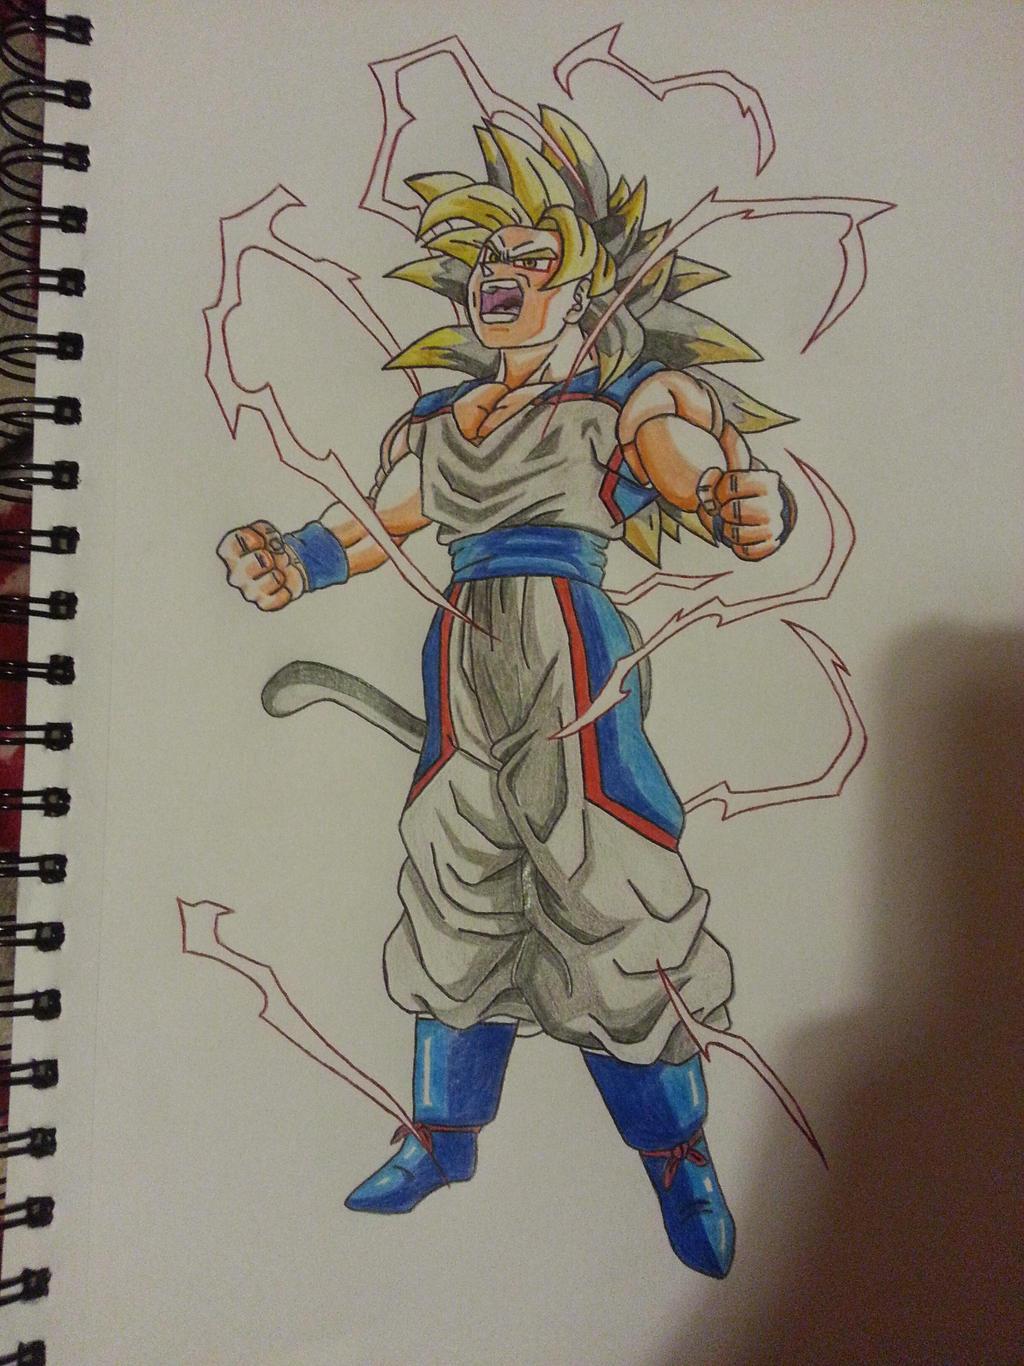 Son Goku Super Saiyan 5 Dbna By Inglip007 On Deviantart